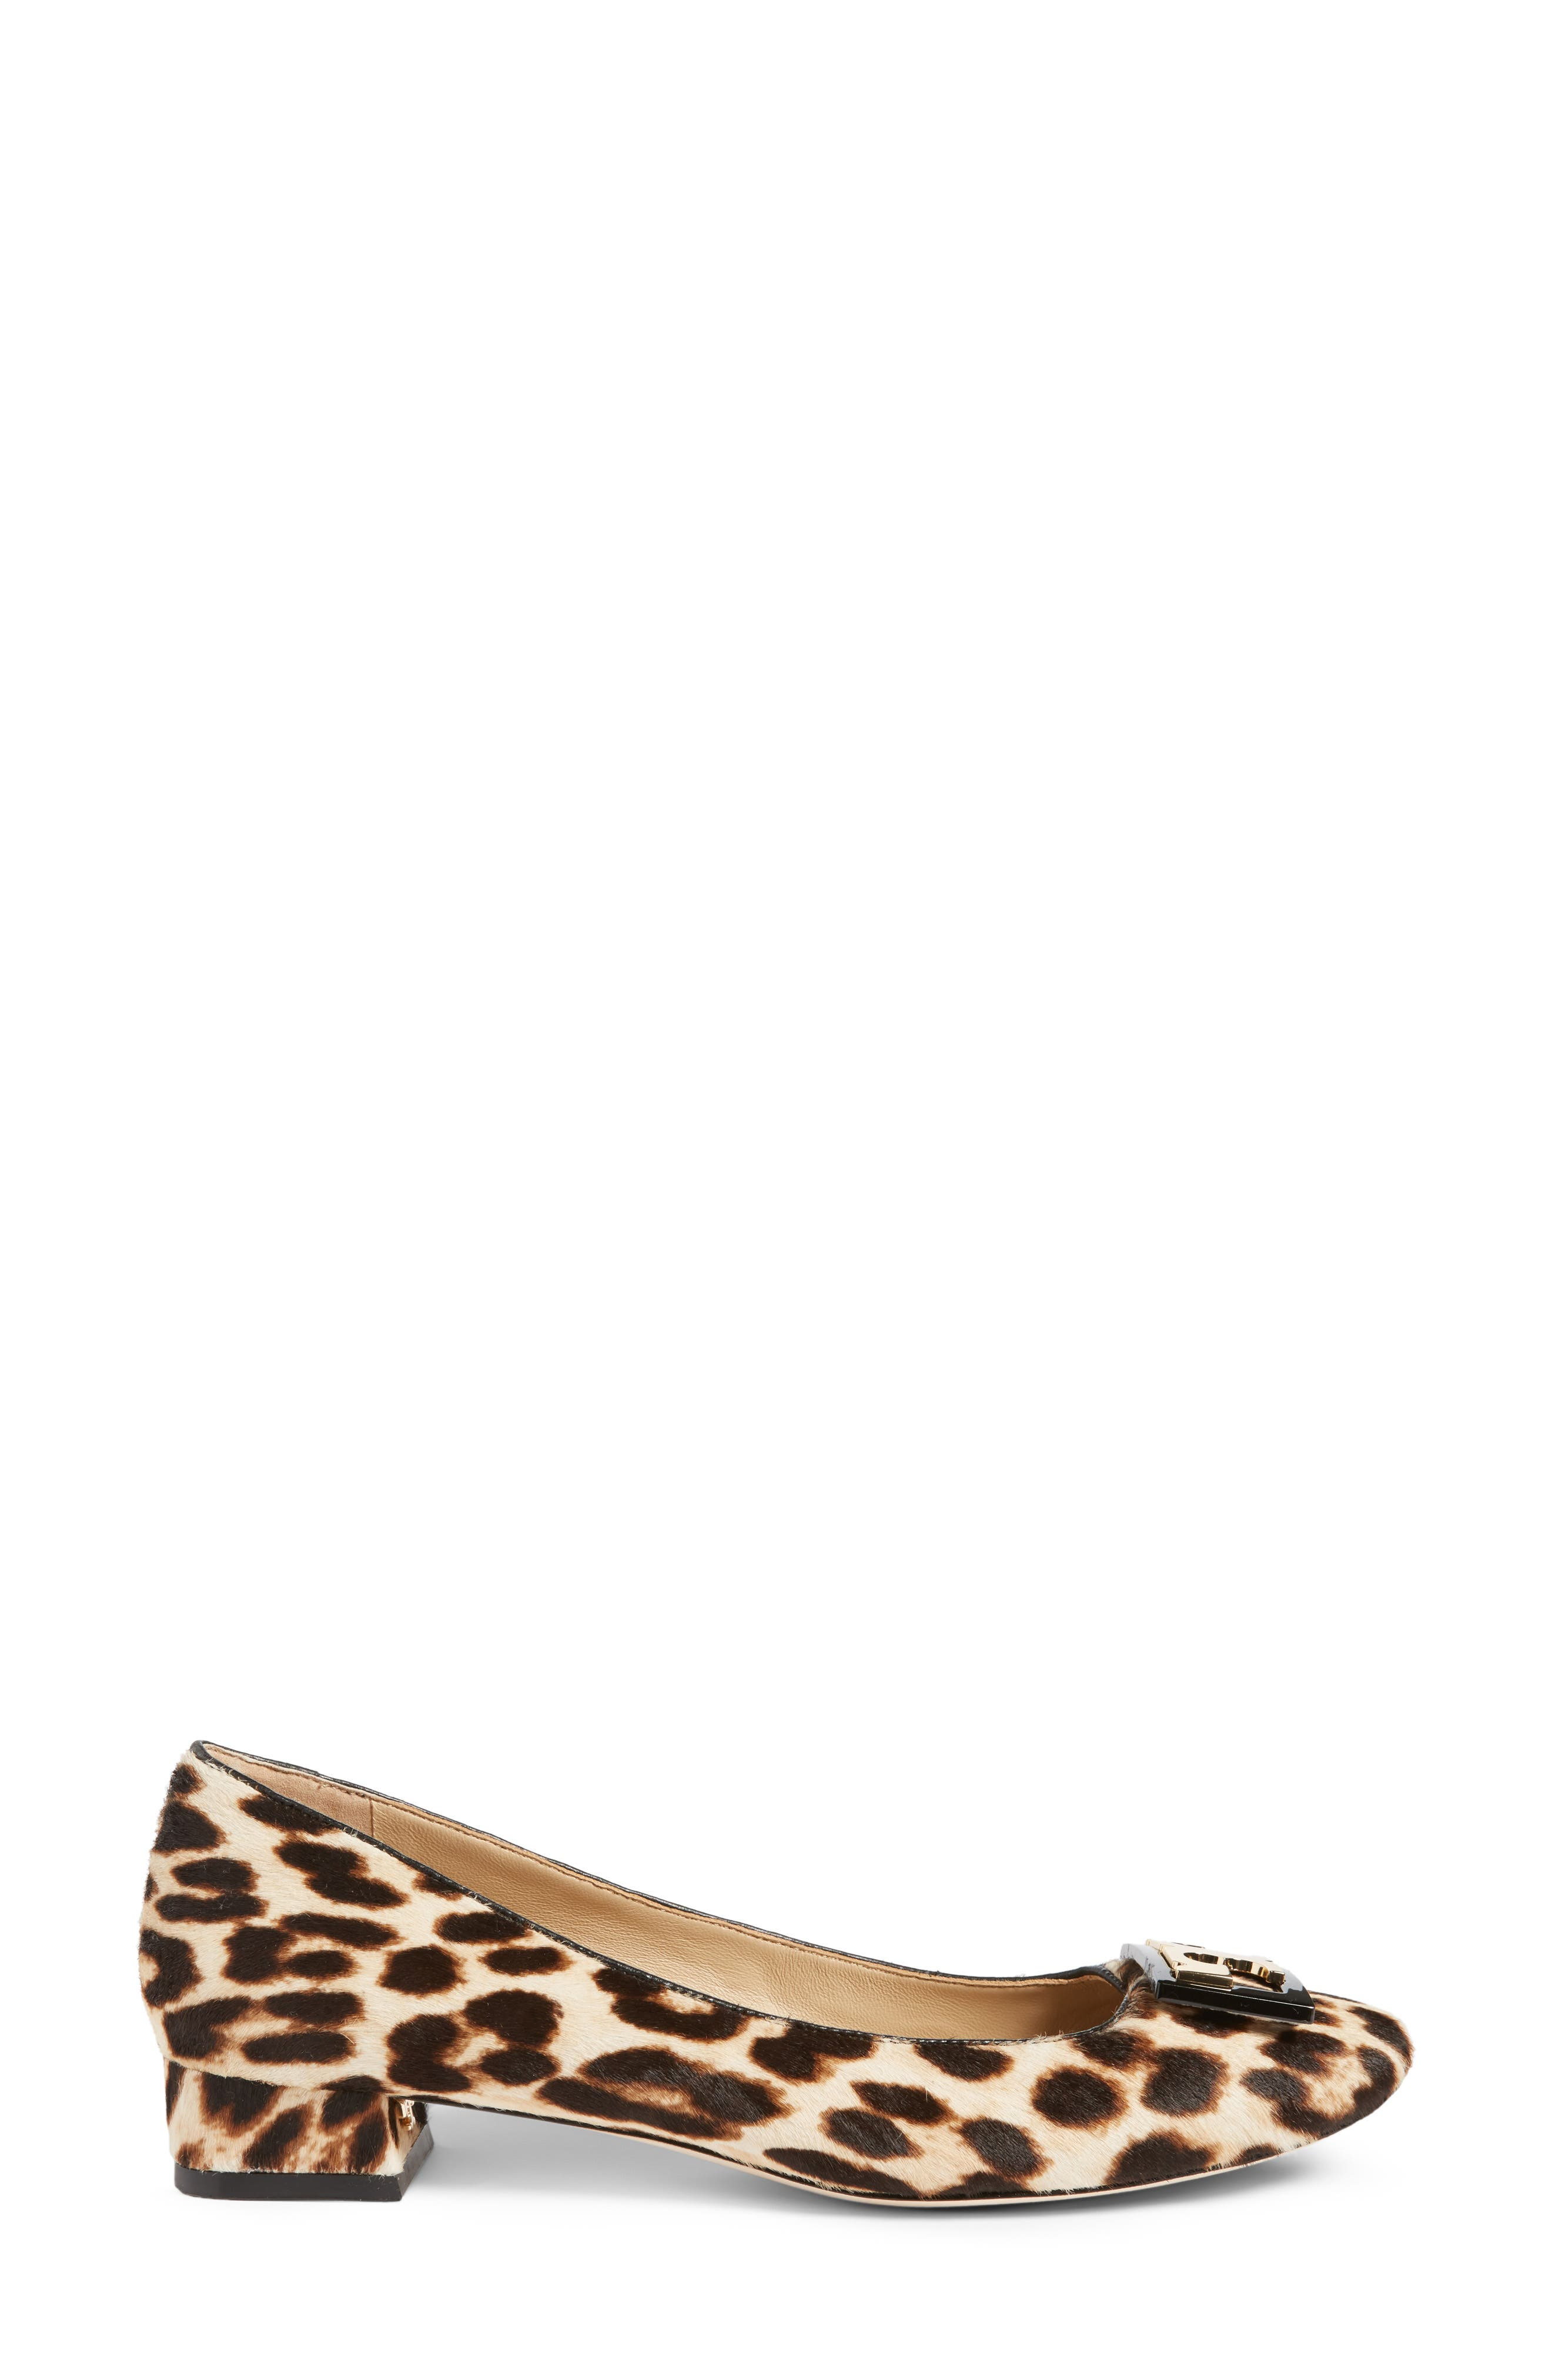 Gigi Block Heel Pump,                             Alternate thumbnail 3, color,                             Natural Leopard